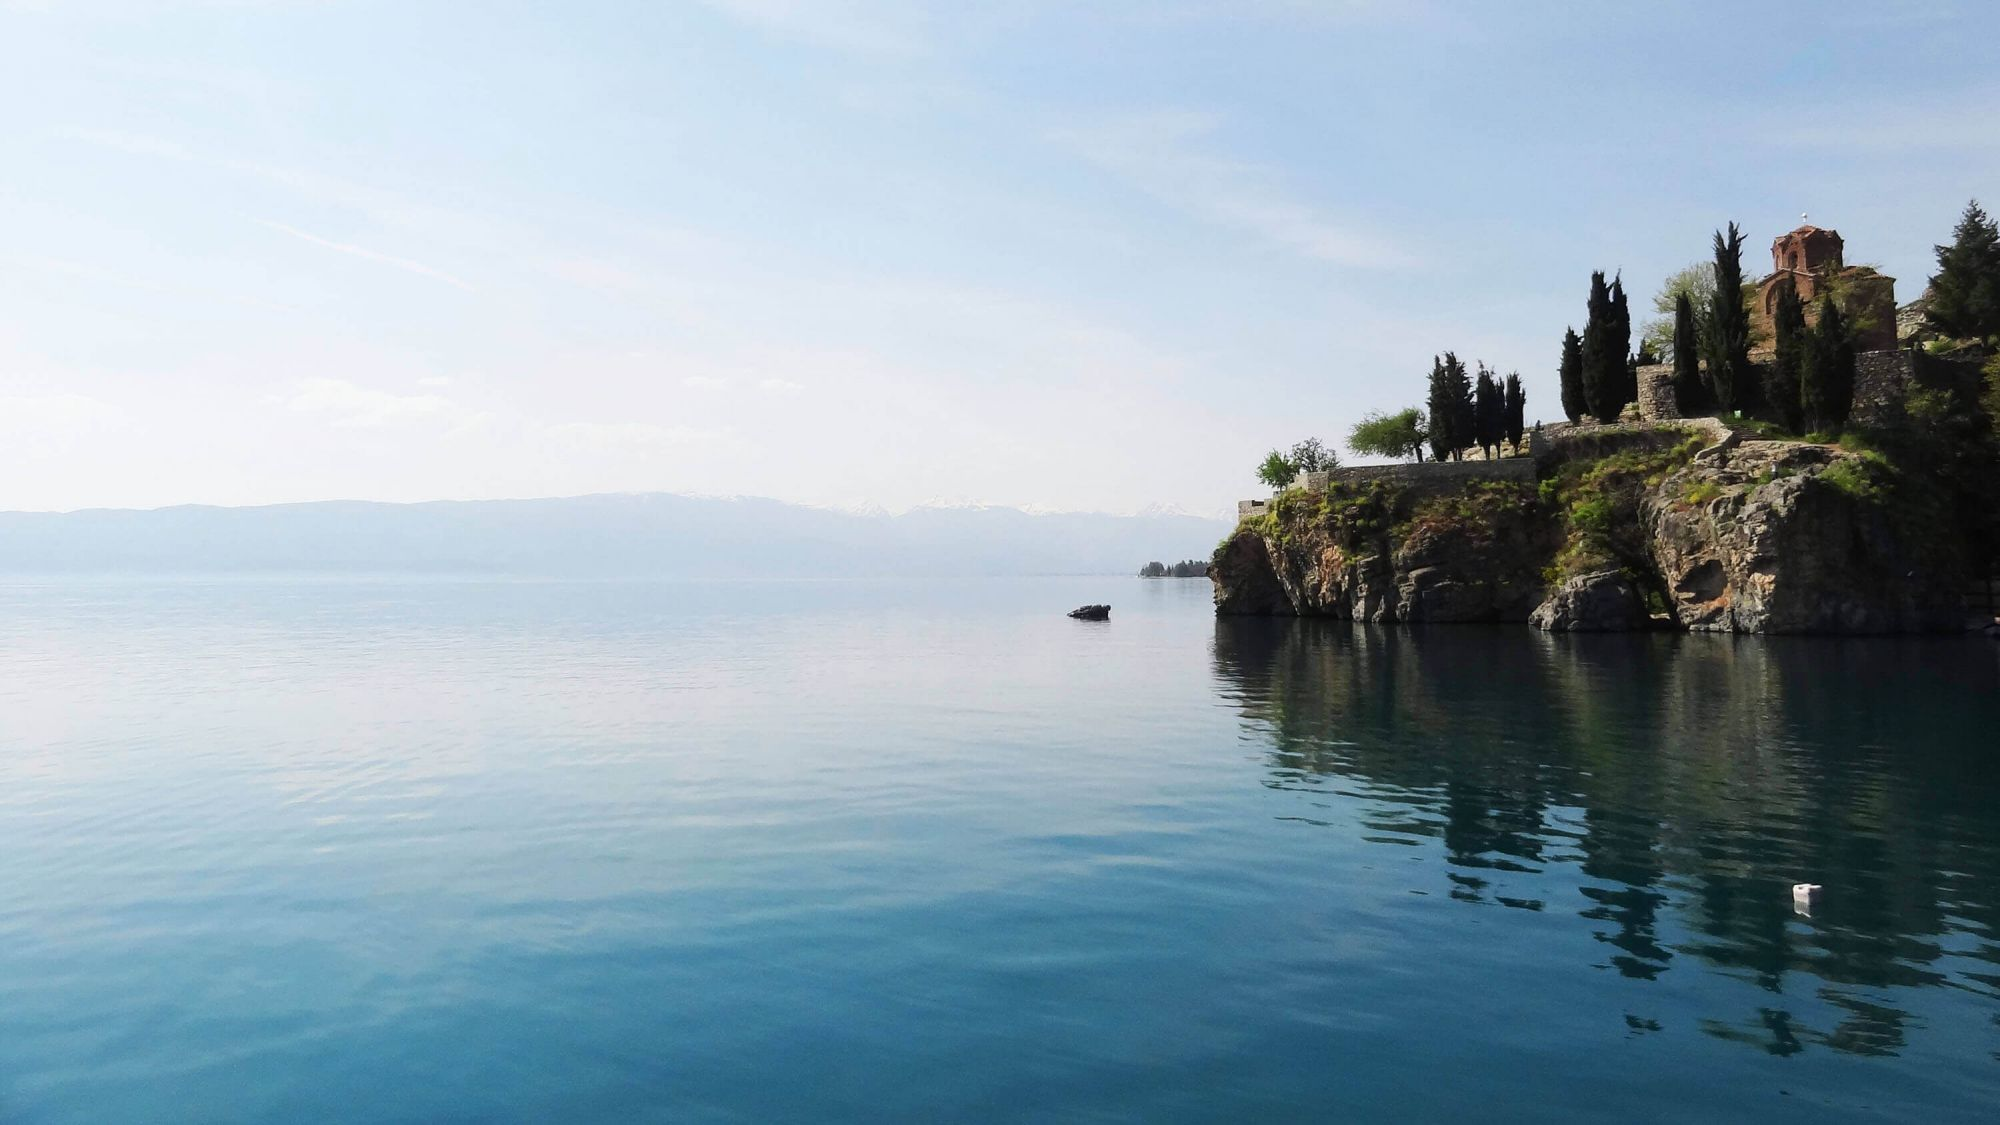 Ohri Gezi Rehberi Makedonya | Ohri Gezi Rehberi Makedonya Ohri Tekne Turu 4